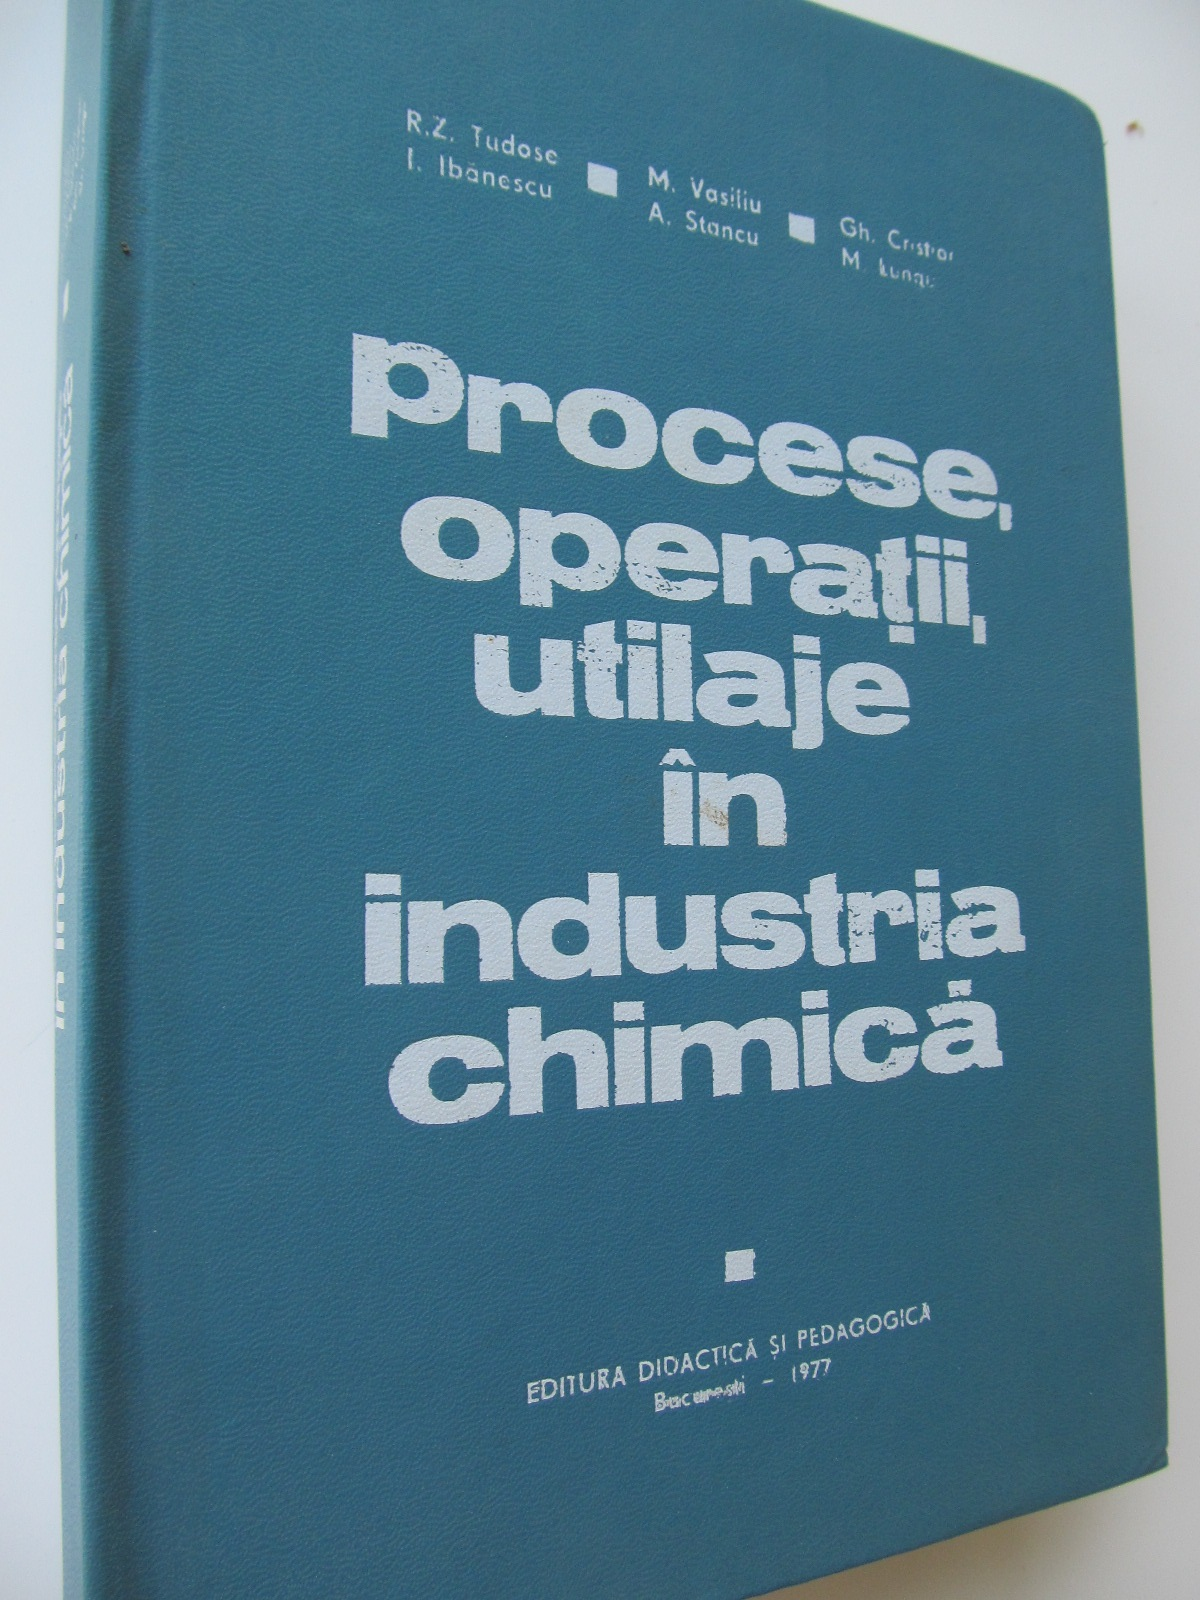 Procese operatii utilaje in industria chimica - R. Z. TudoM. Vasiliu , .. | Detalii carte